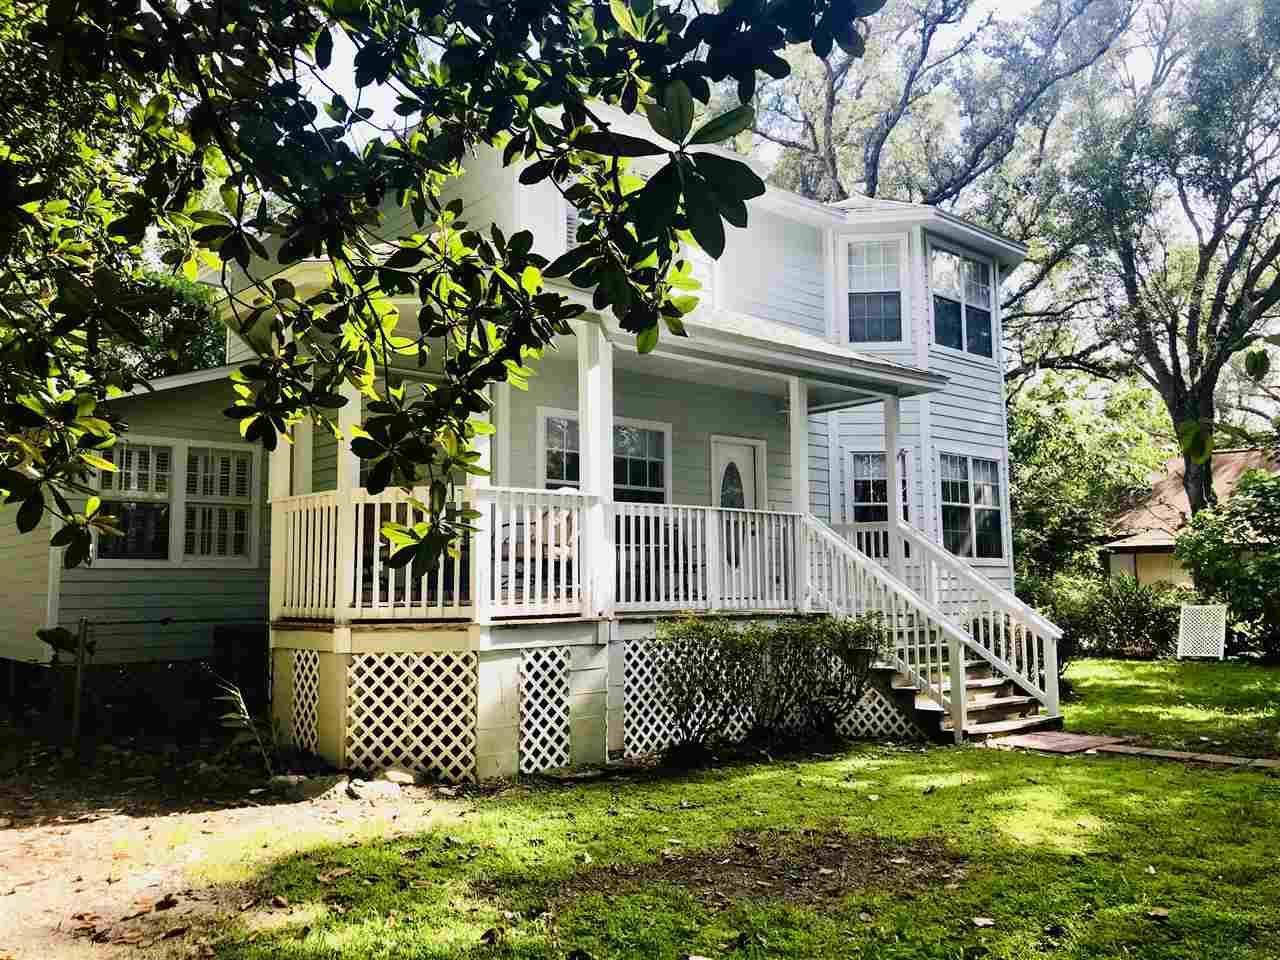 5726 Fair Oak Ln, Pensacola, FL 32507